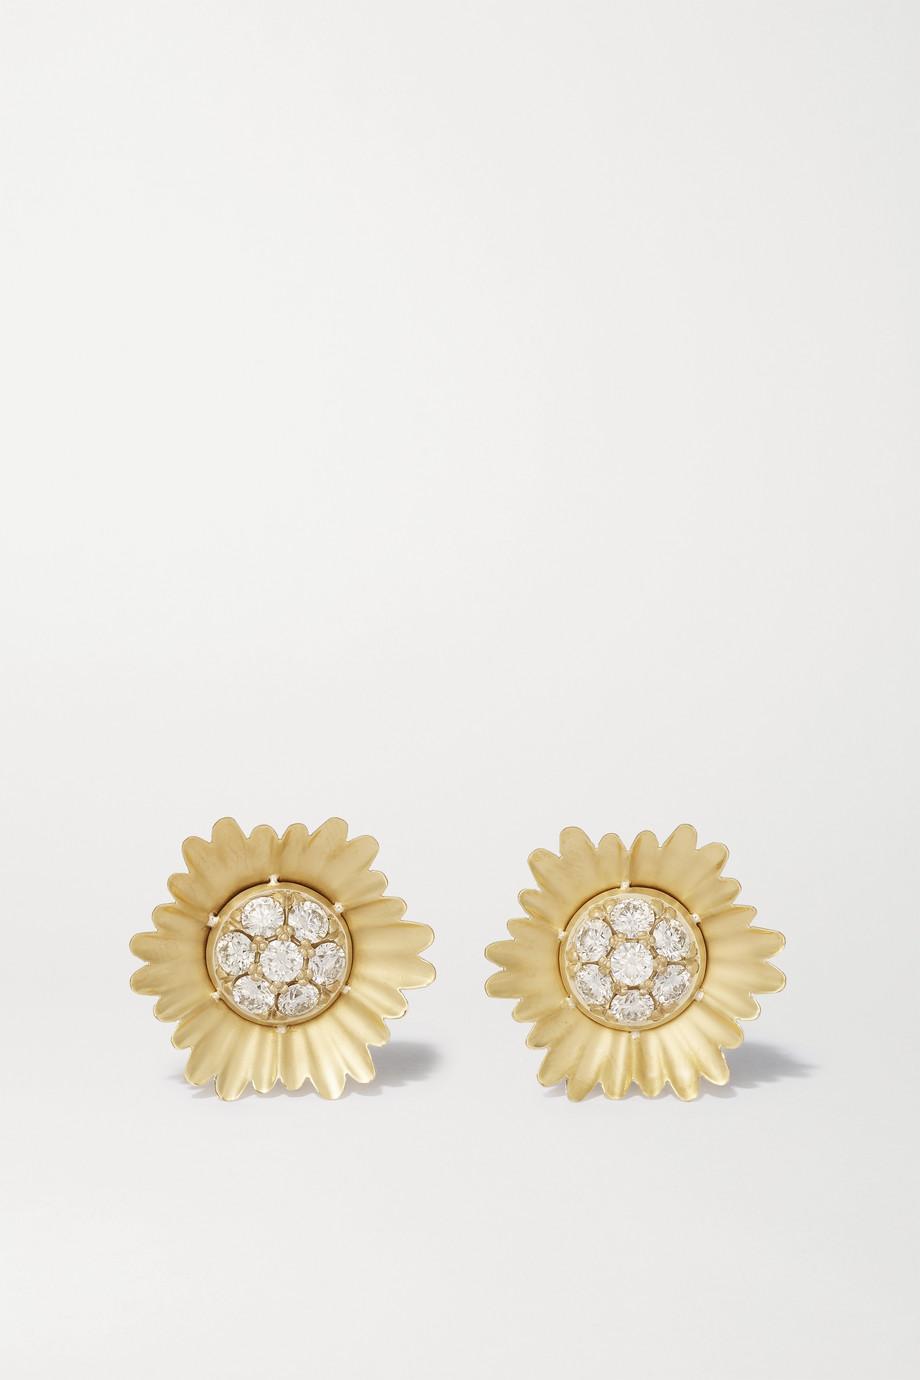 Irene Neuwirth Super Bloom 18K 黄金、18K 白金、钻石耳钉